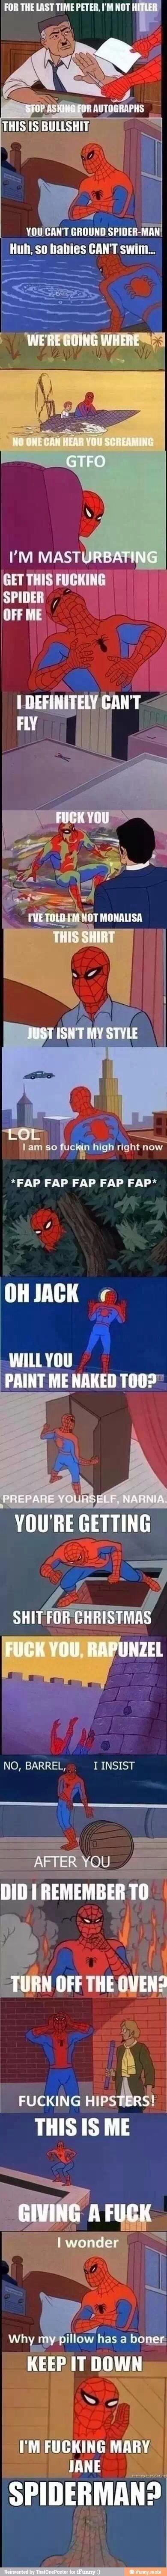 Spidey humor